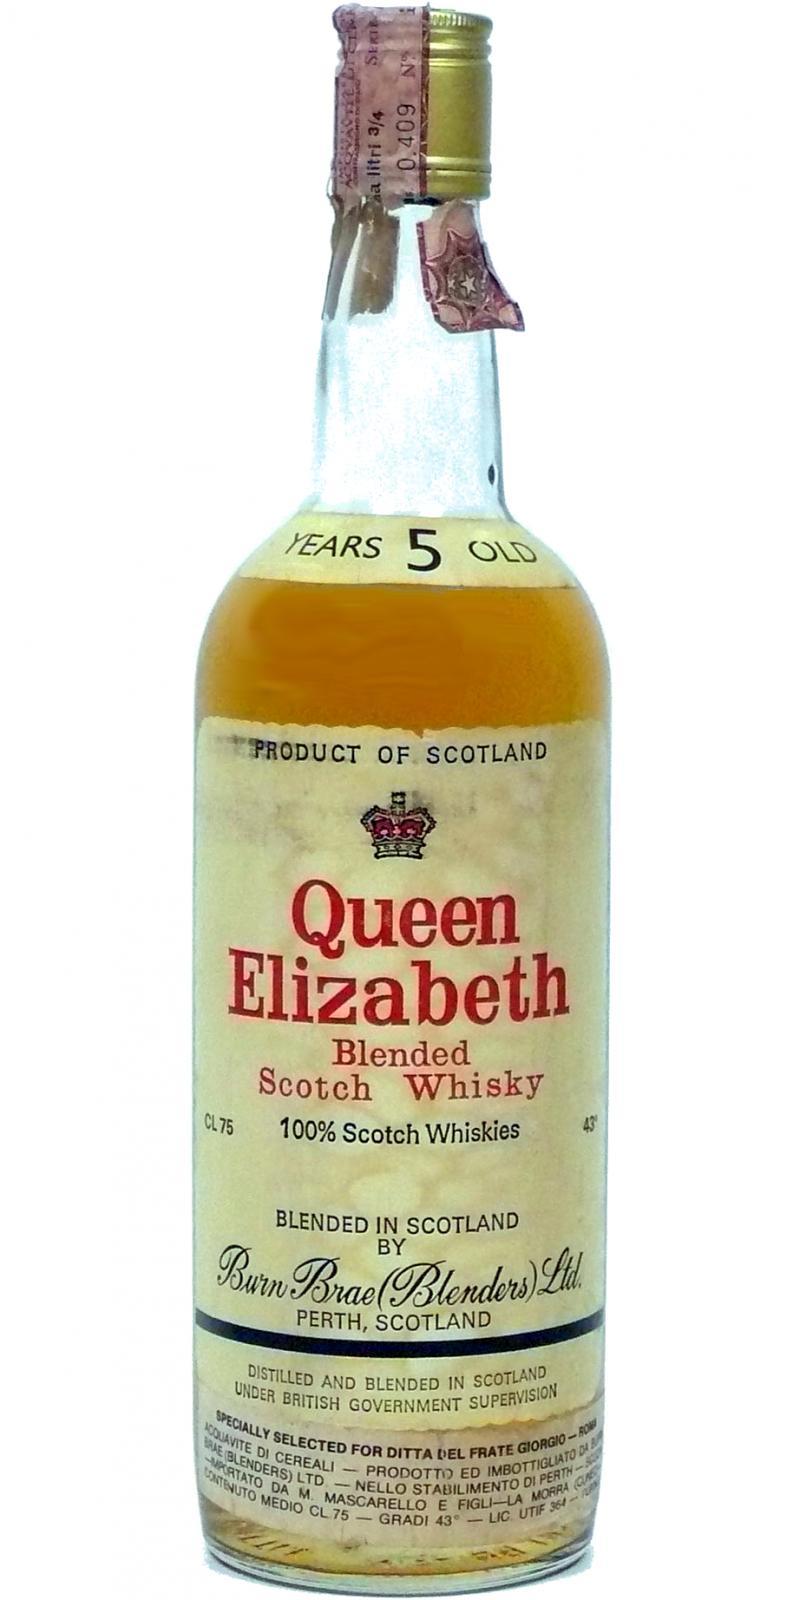 Queen Elizabeth 05-year-old